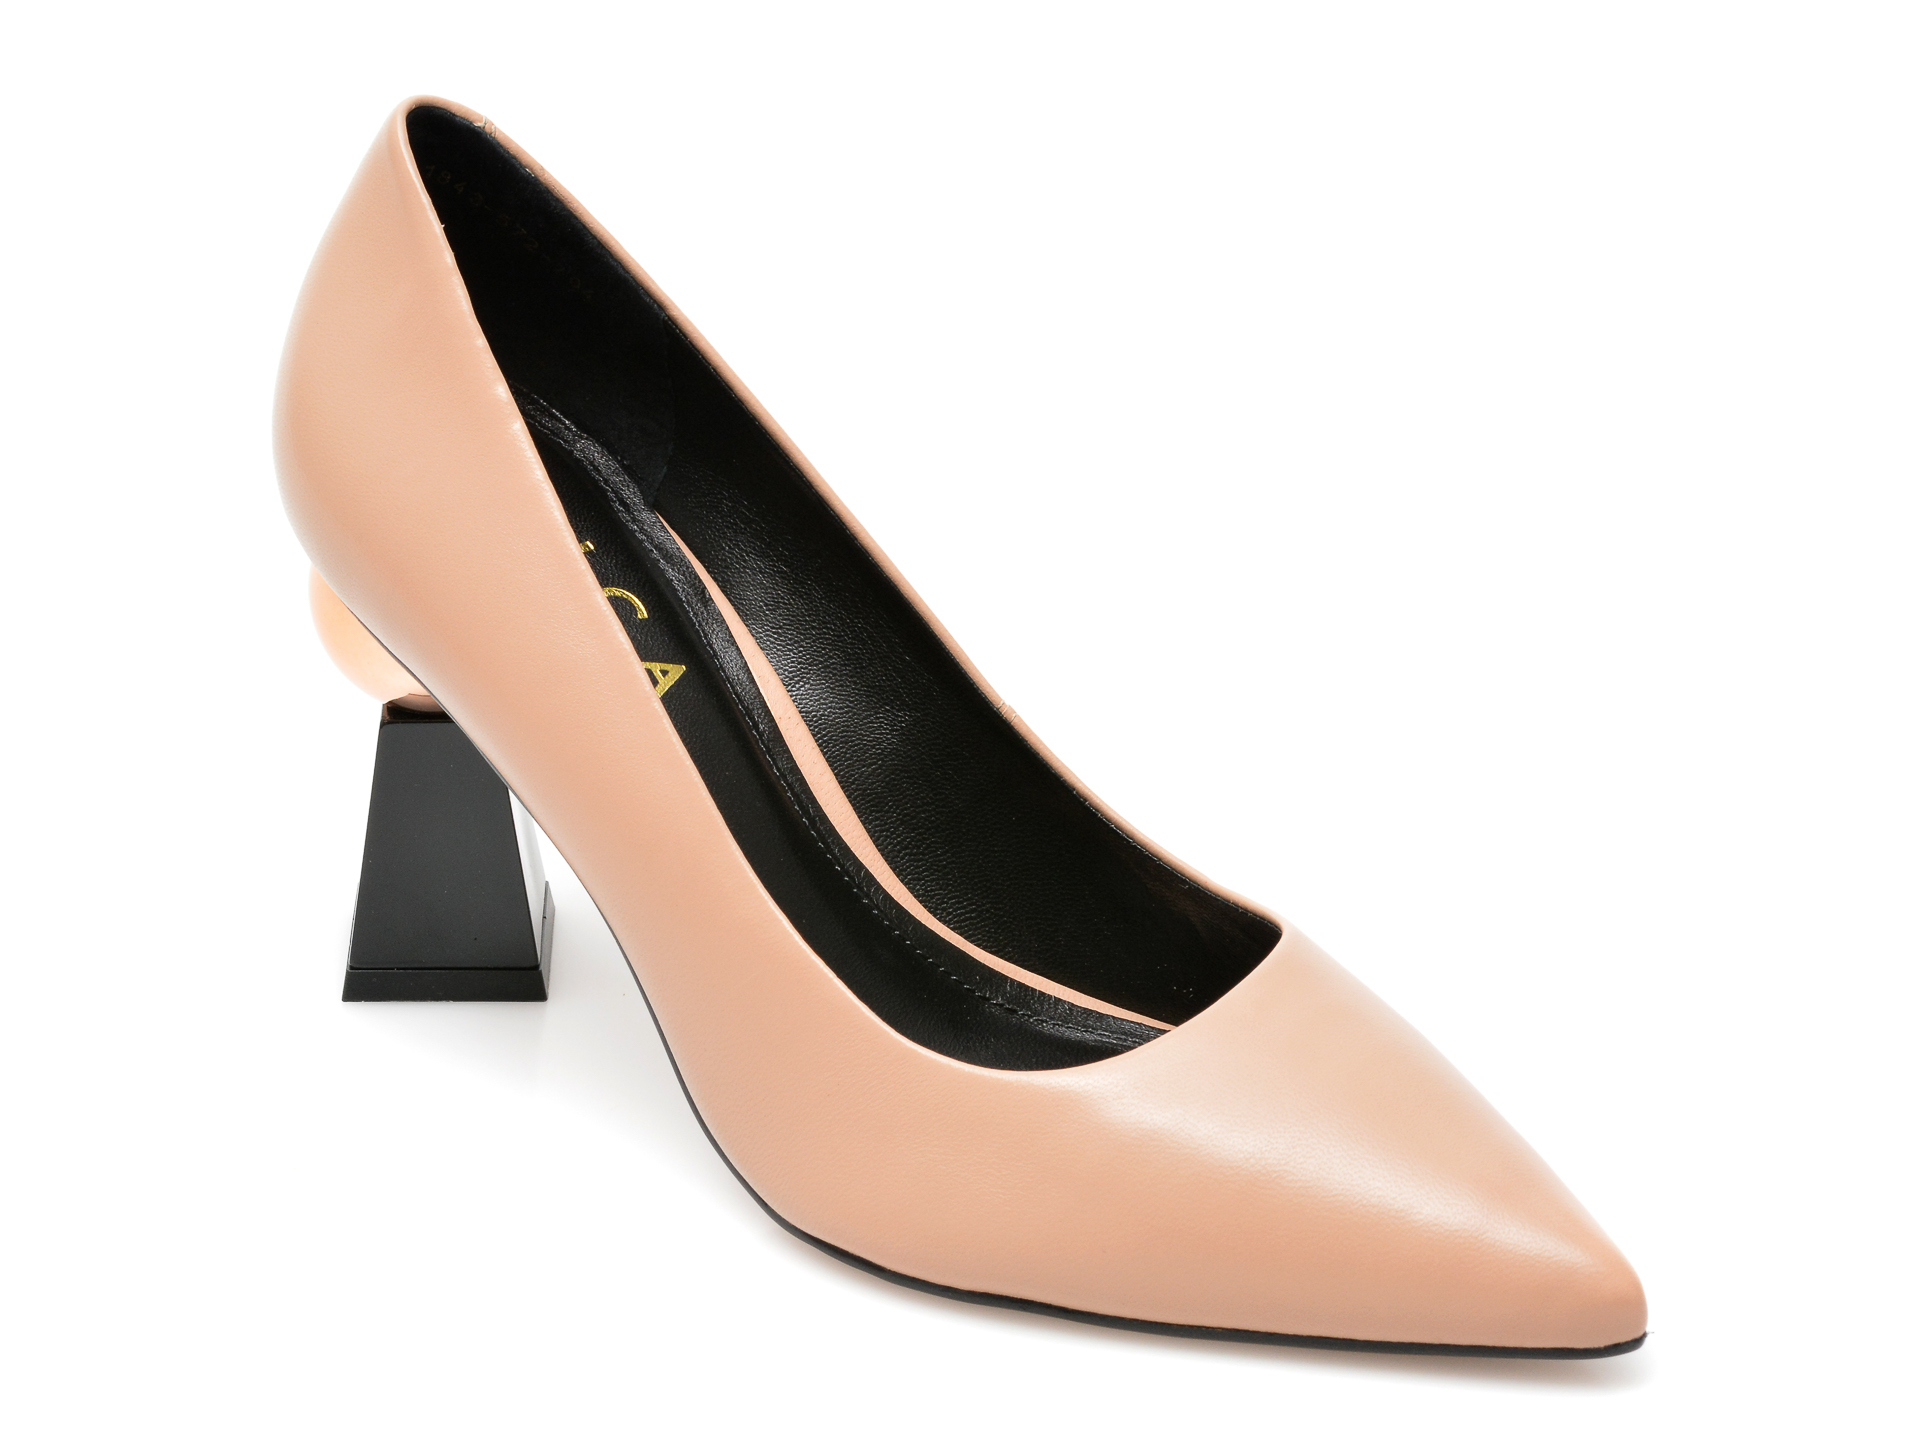 Pantofi EPICA bej, 1843704, din piele naturala imagine otter.ro 2021